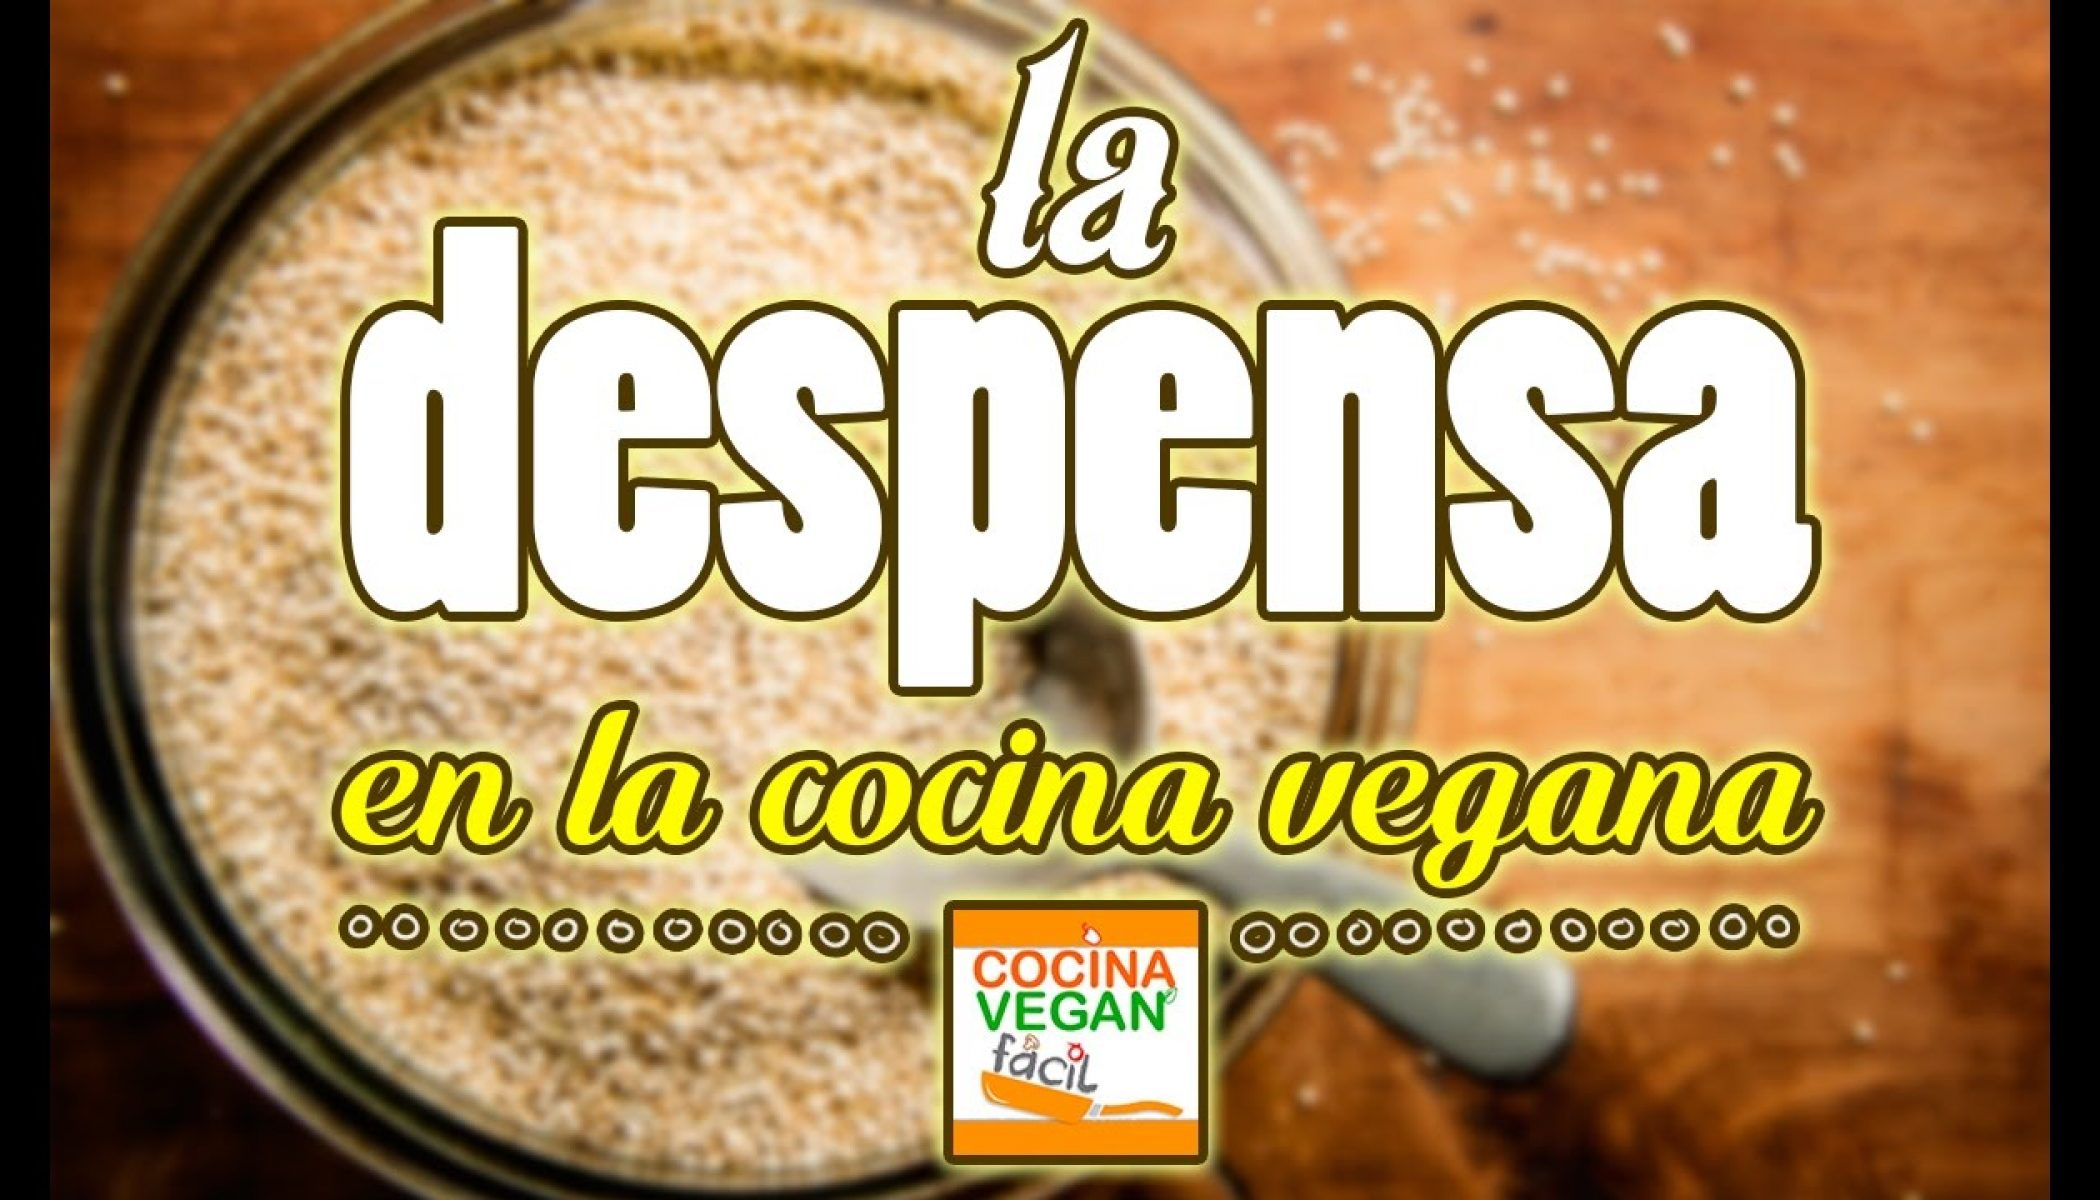 La Despensa En La Cocina Vegana Cocina Vegan Facil